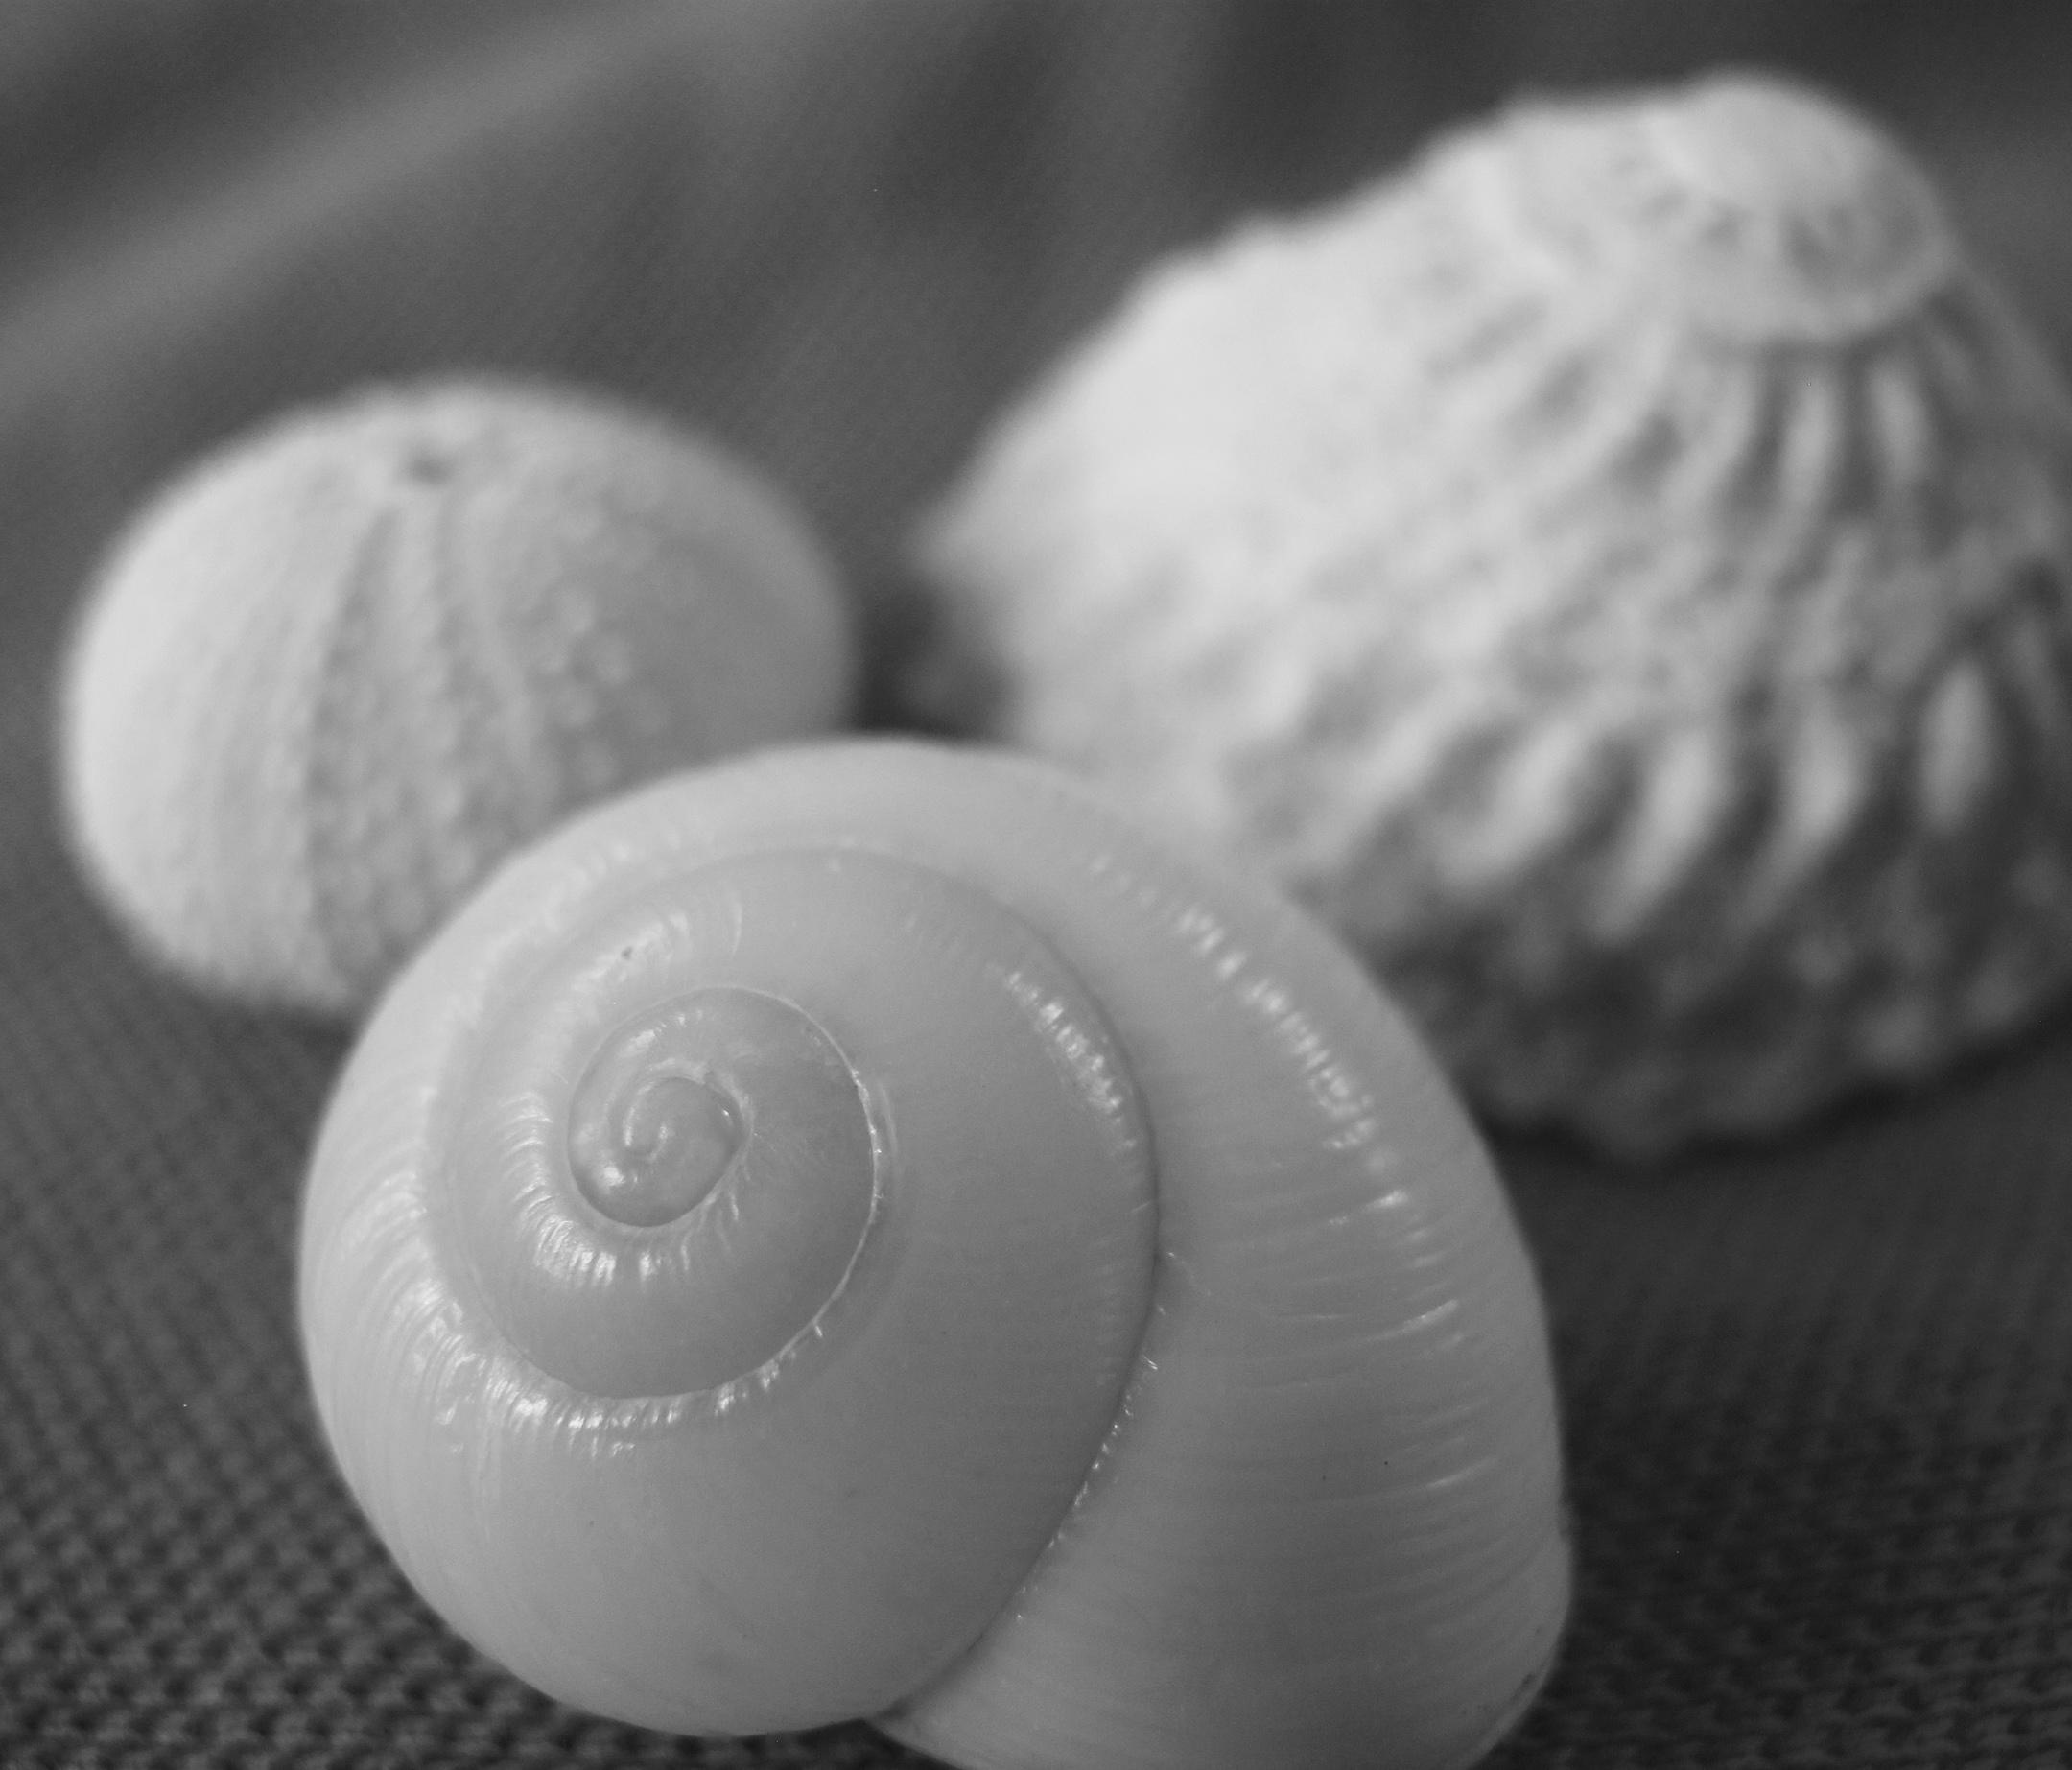 seashells, bahamas, abaco, green turtle cay